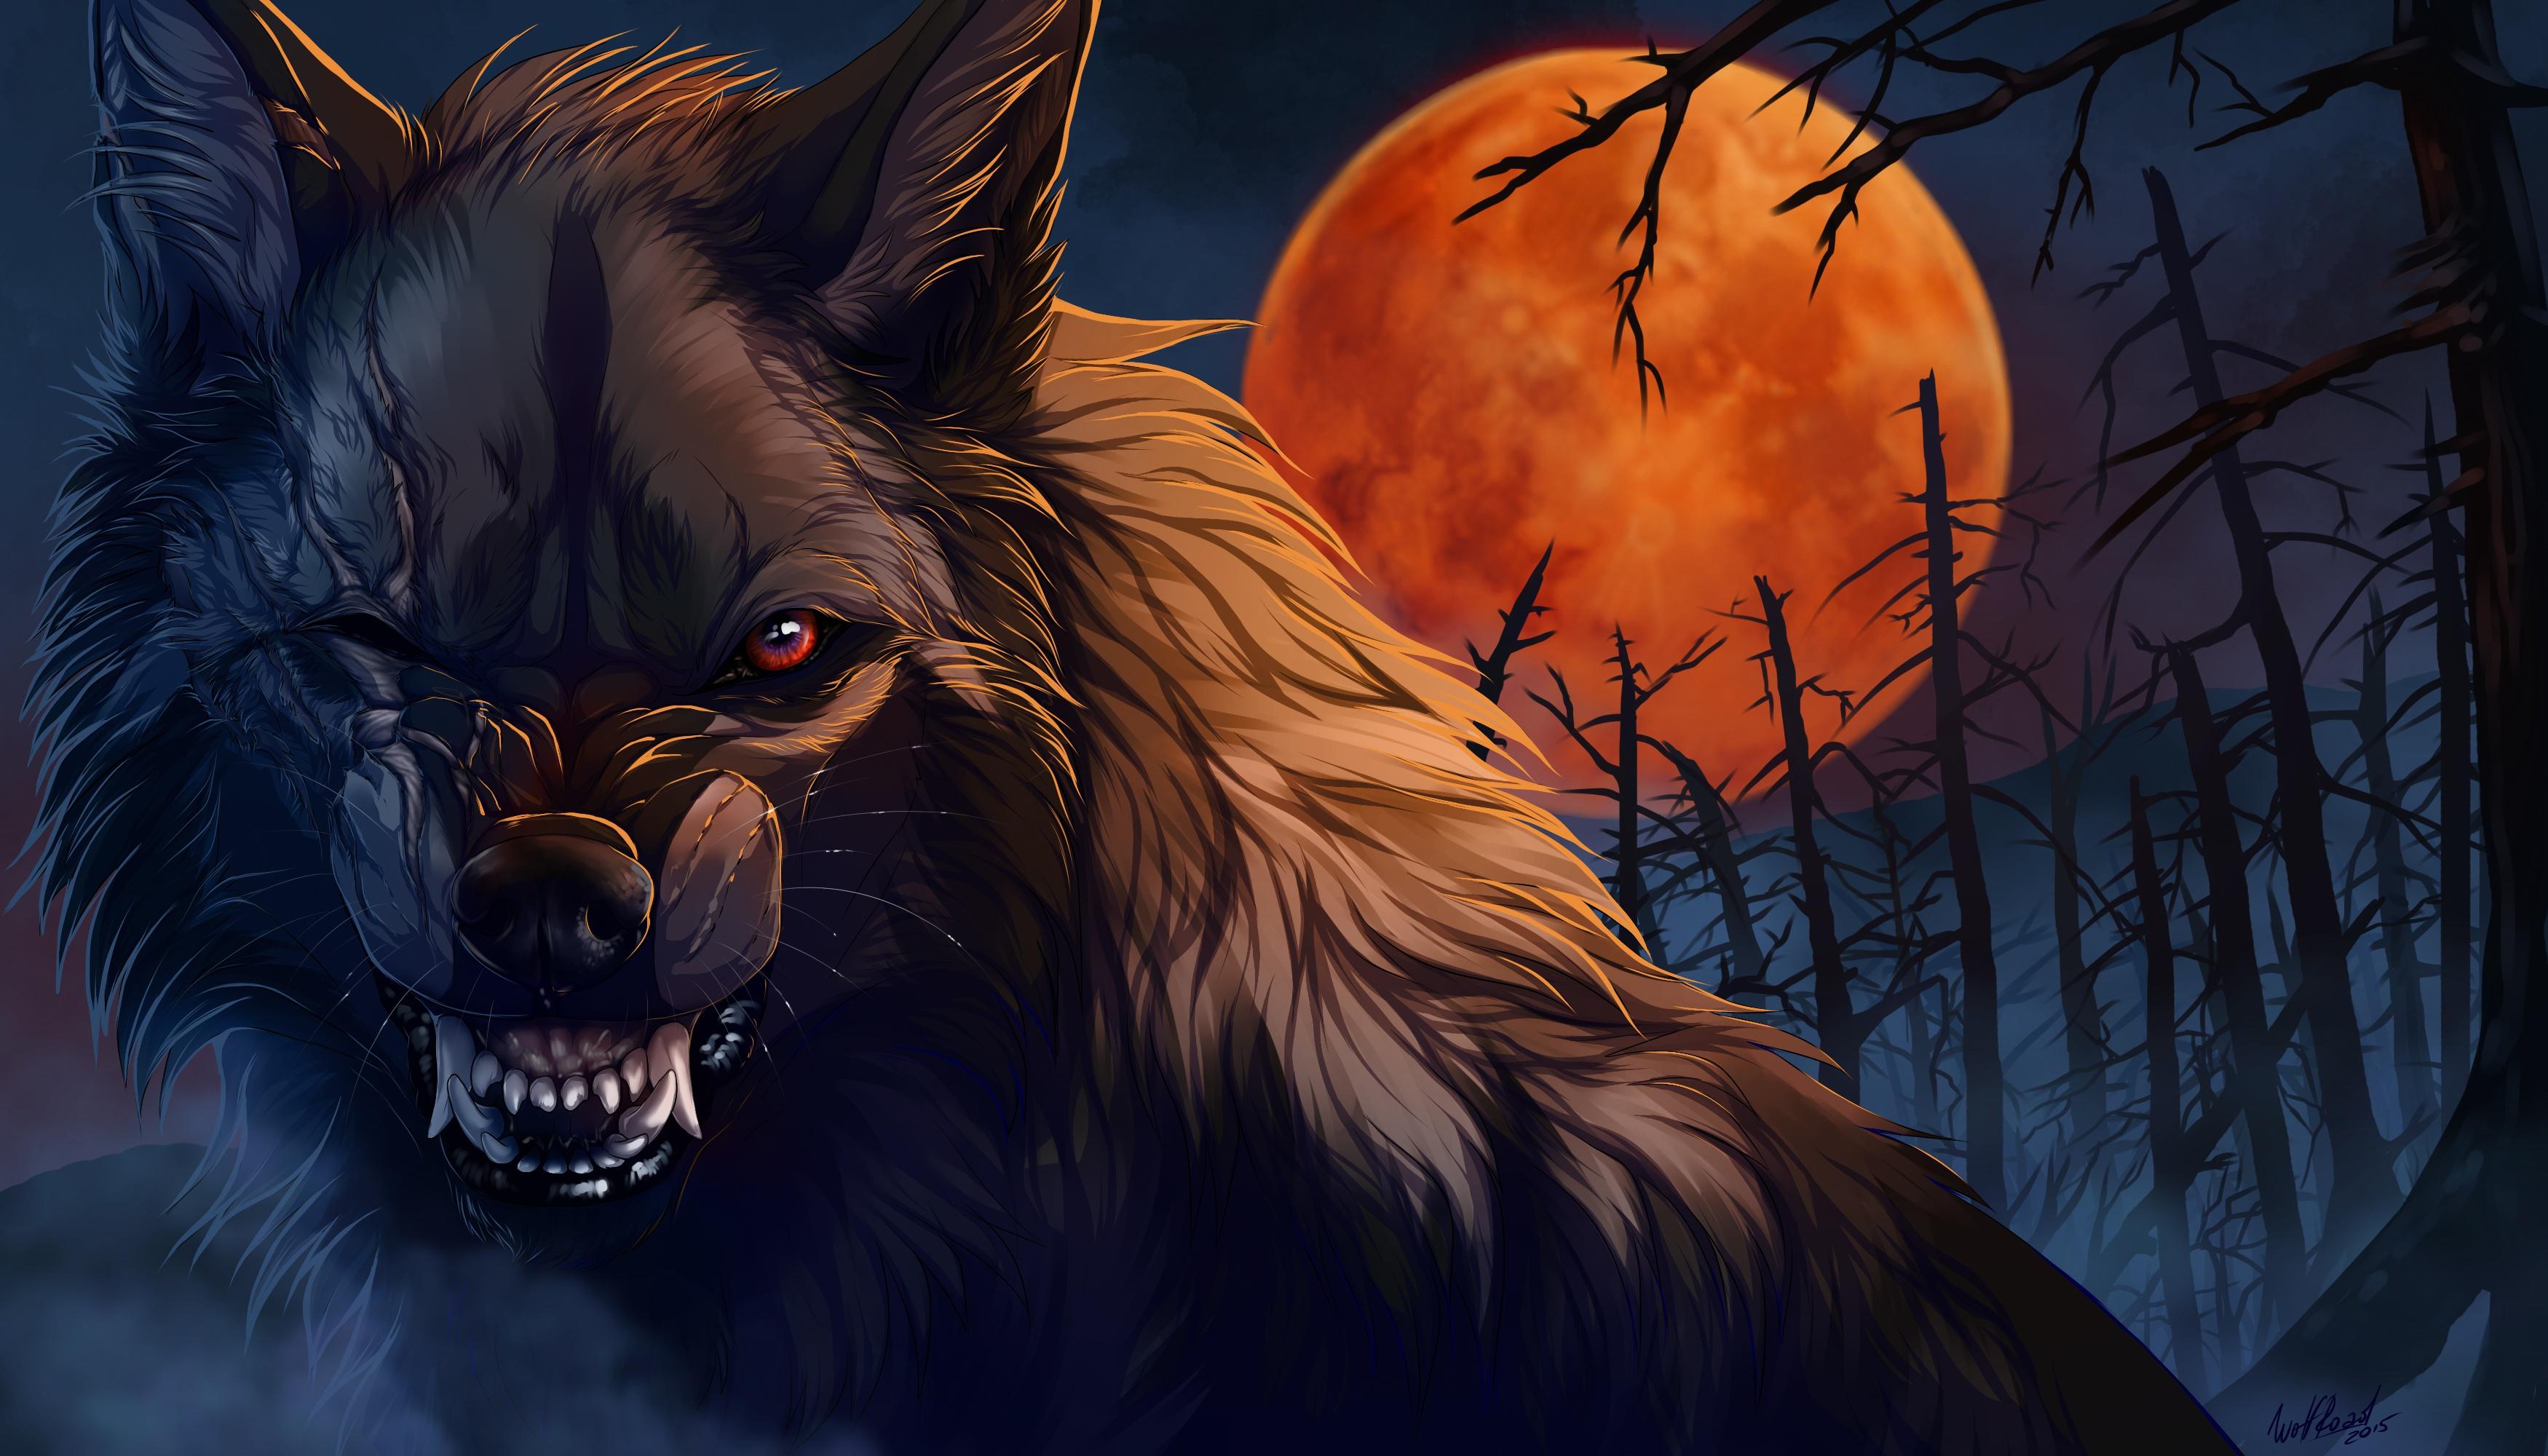 wolf roar artwork, hd artist, 4k wallpapers, images, backgrounds